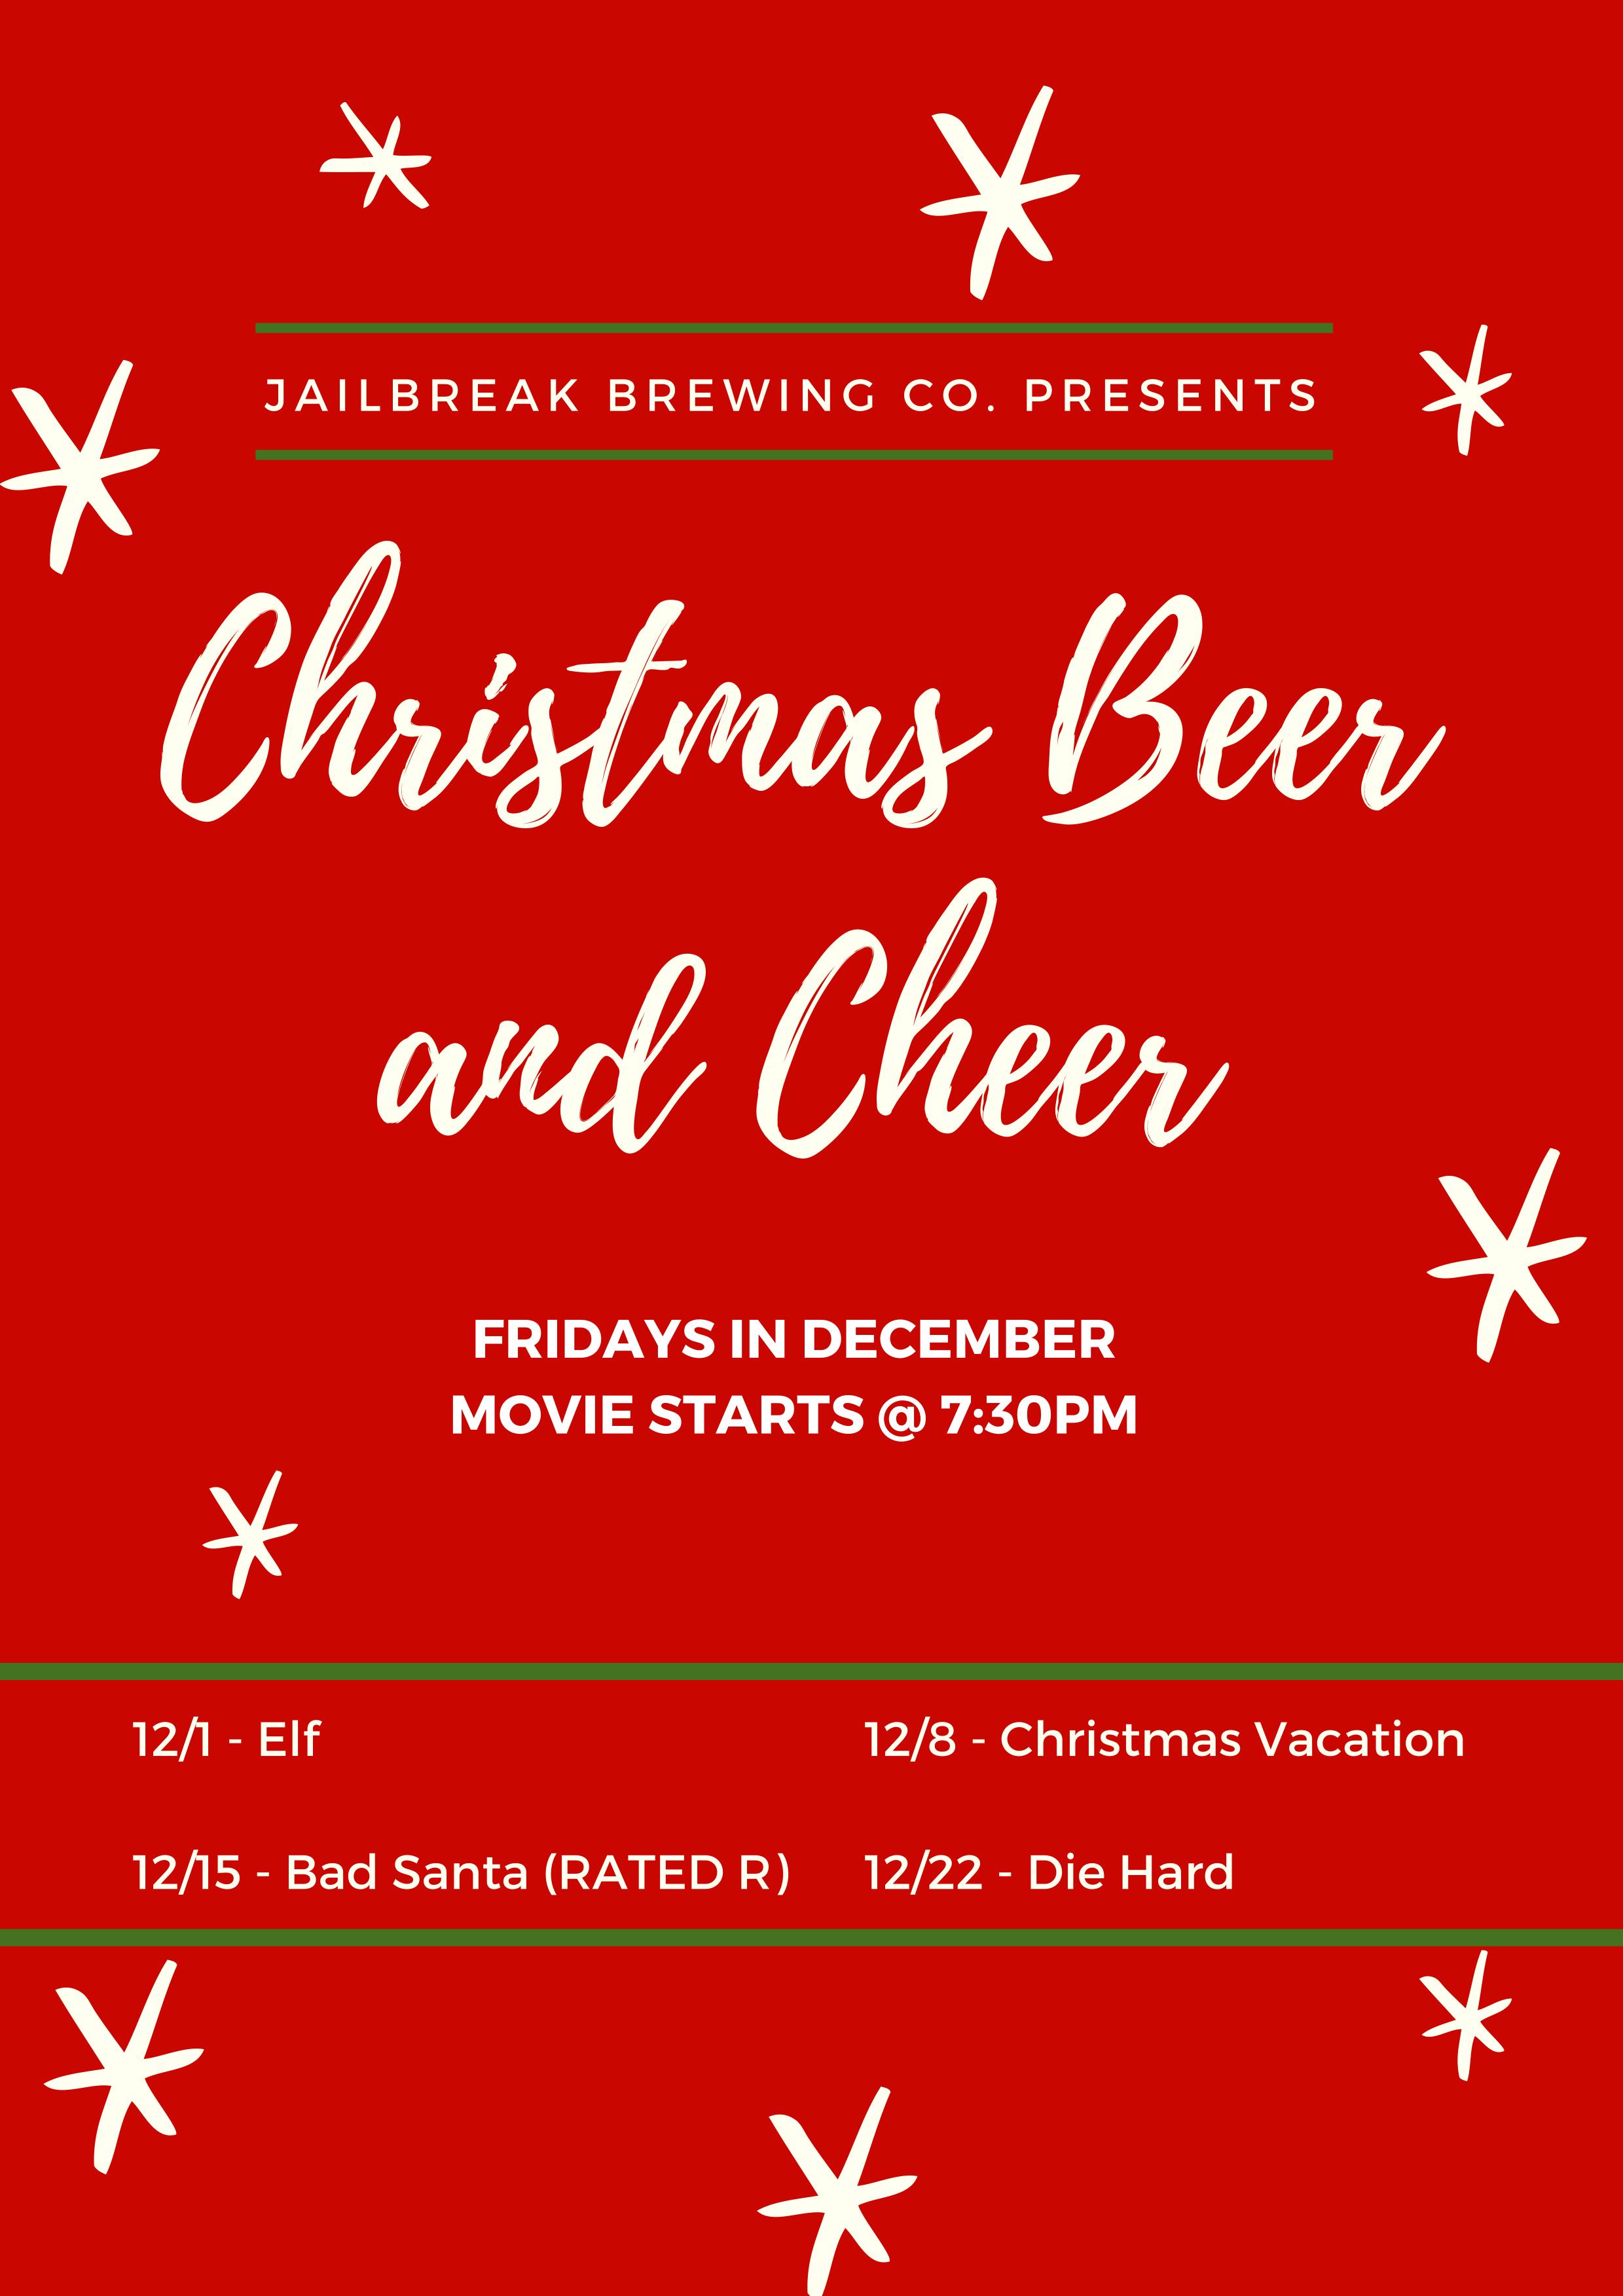 Christmas Beer.Christmas Beer And Cheer Jailbreak Brewing Company